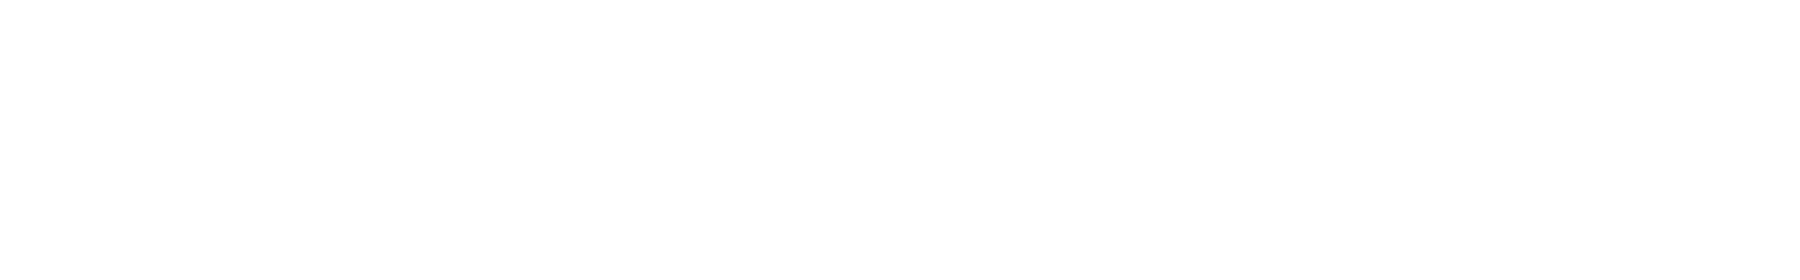 dp sequence apreg loop16